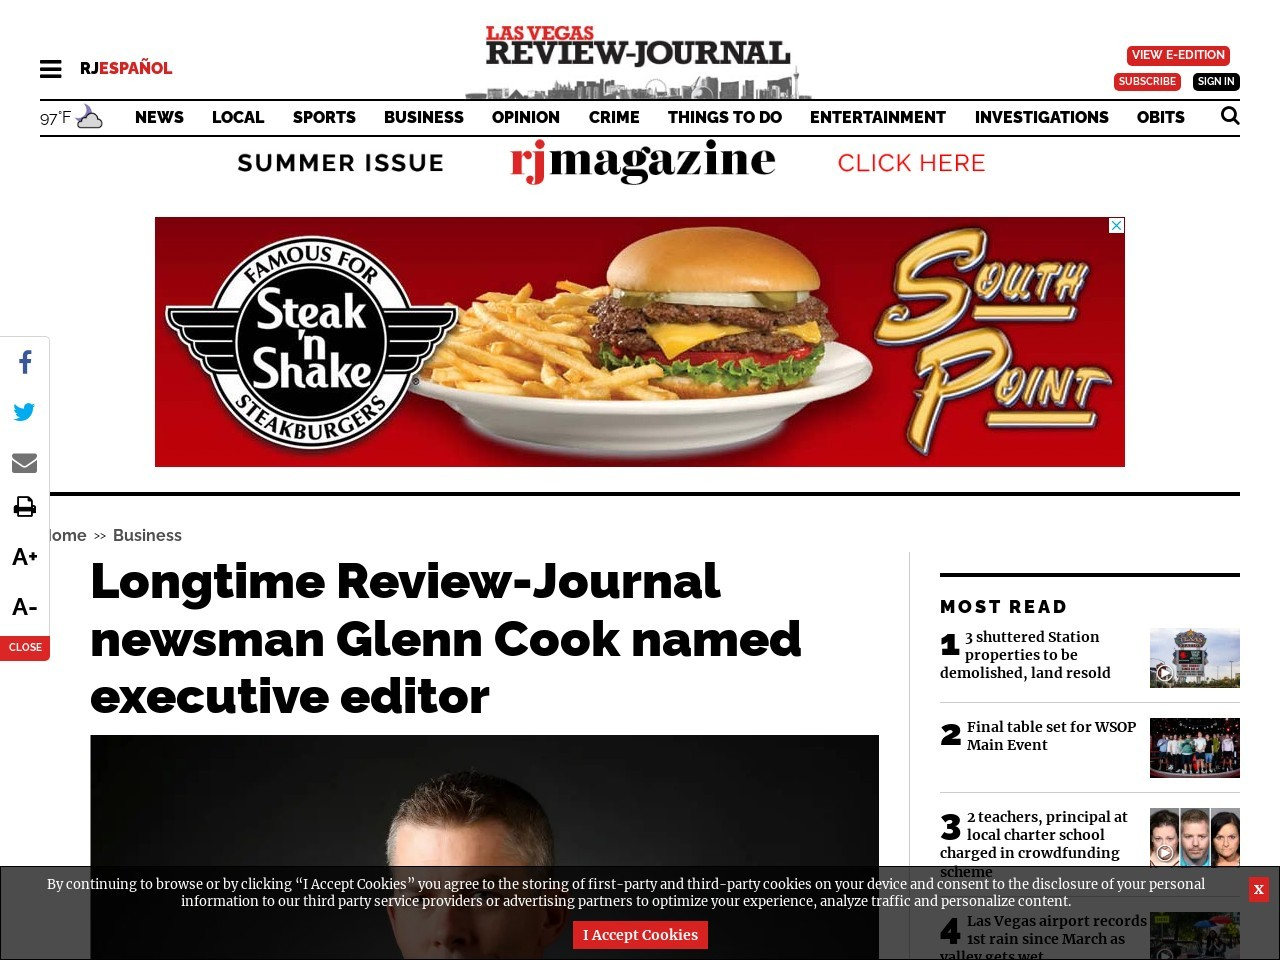 Longtime Review-Journal newsman Glenn Cook named executive editor